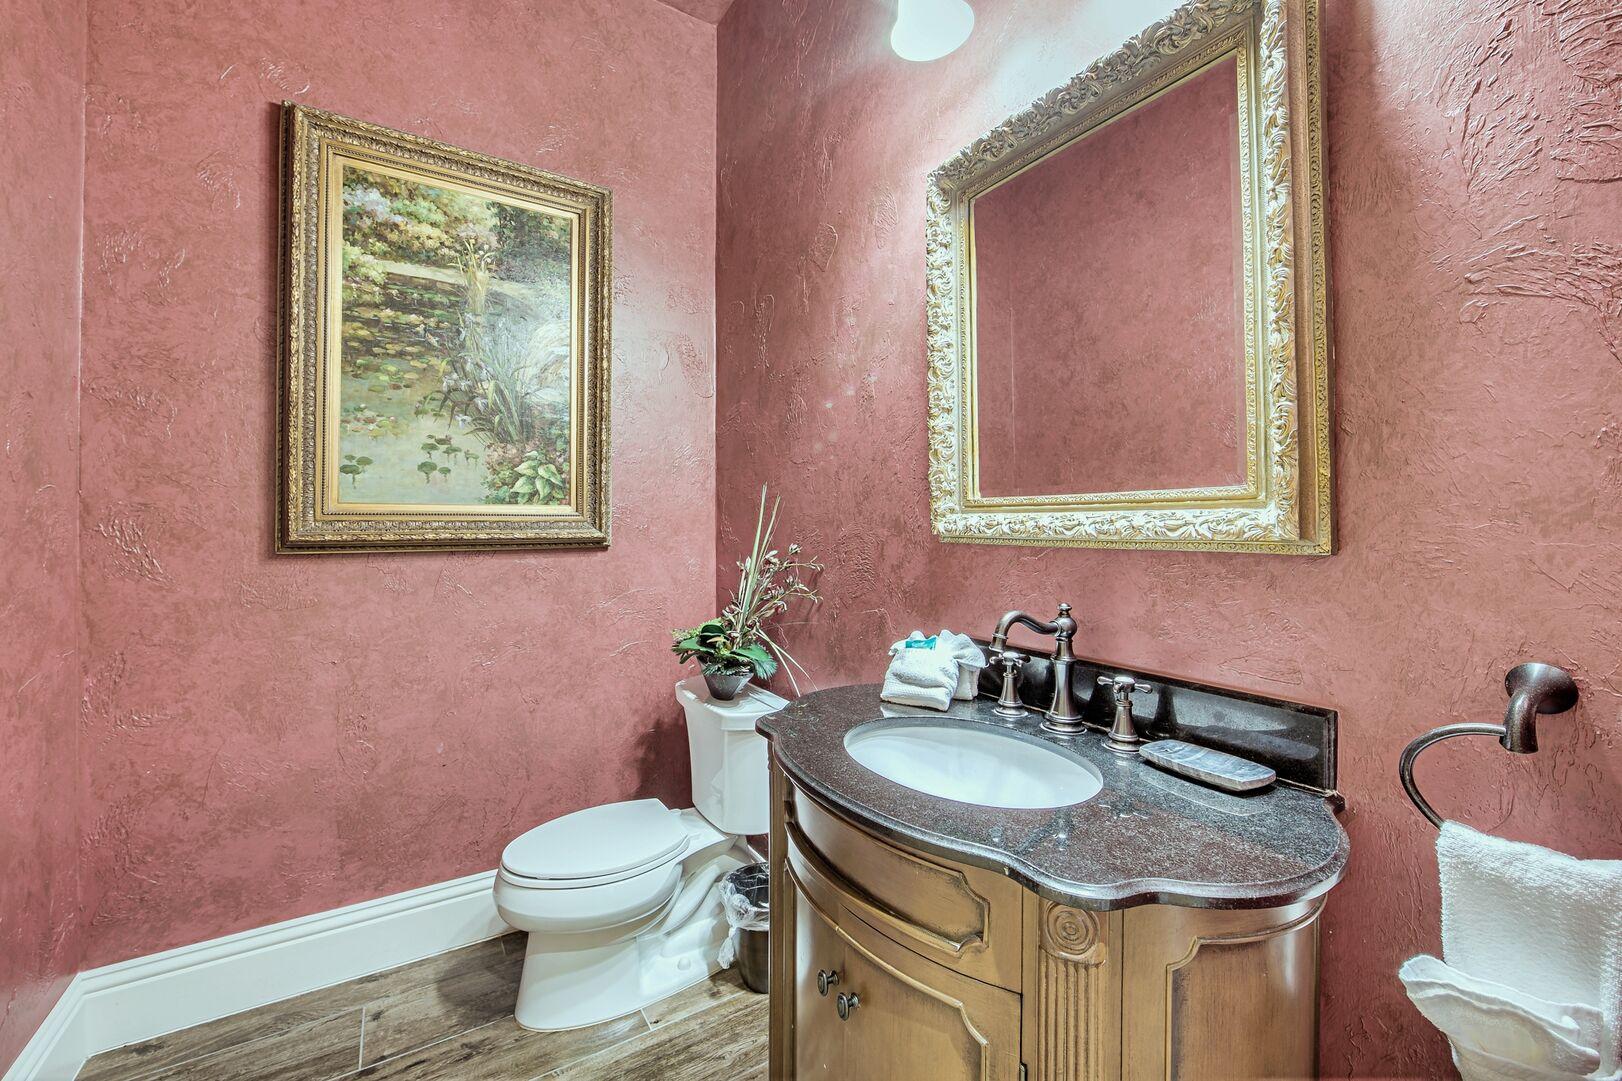 Bathroom with Single Vanity Sink, Mirror, and Toilet.